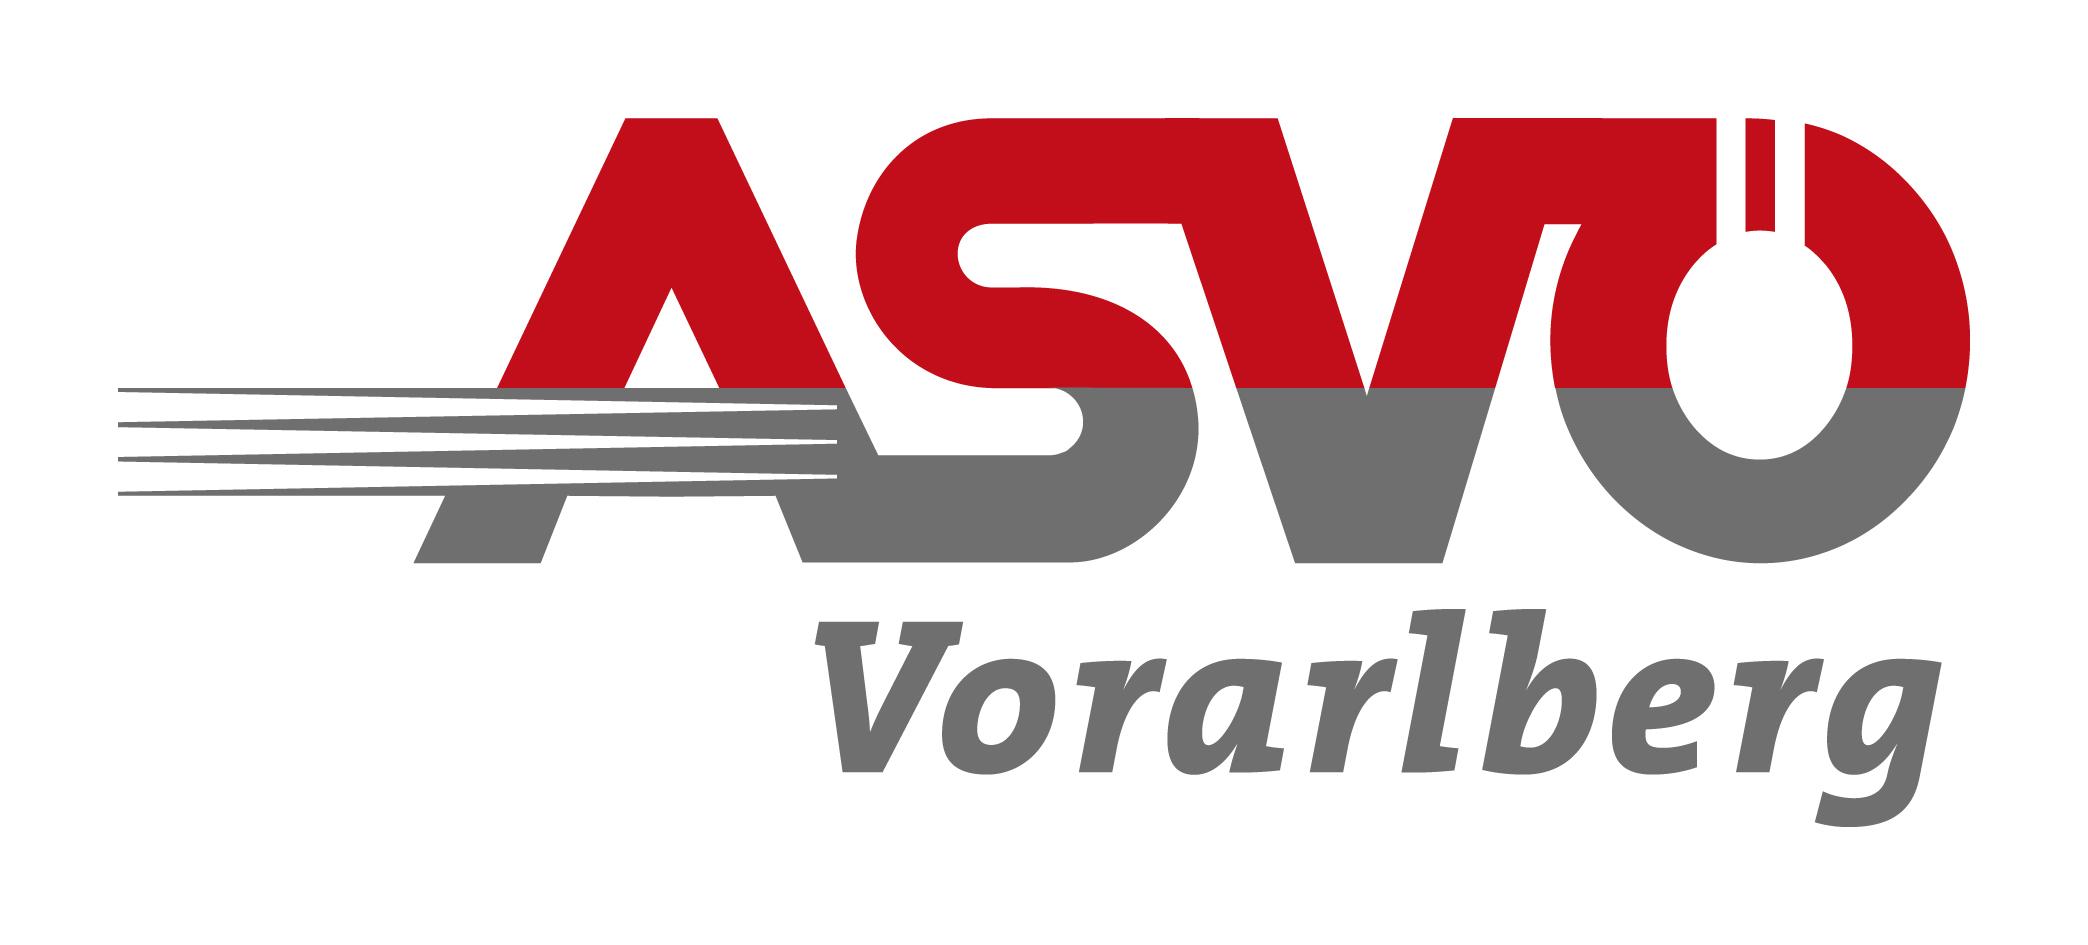 ASVOE-Vorarlberg_2018_JPG.jpg